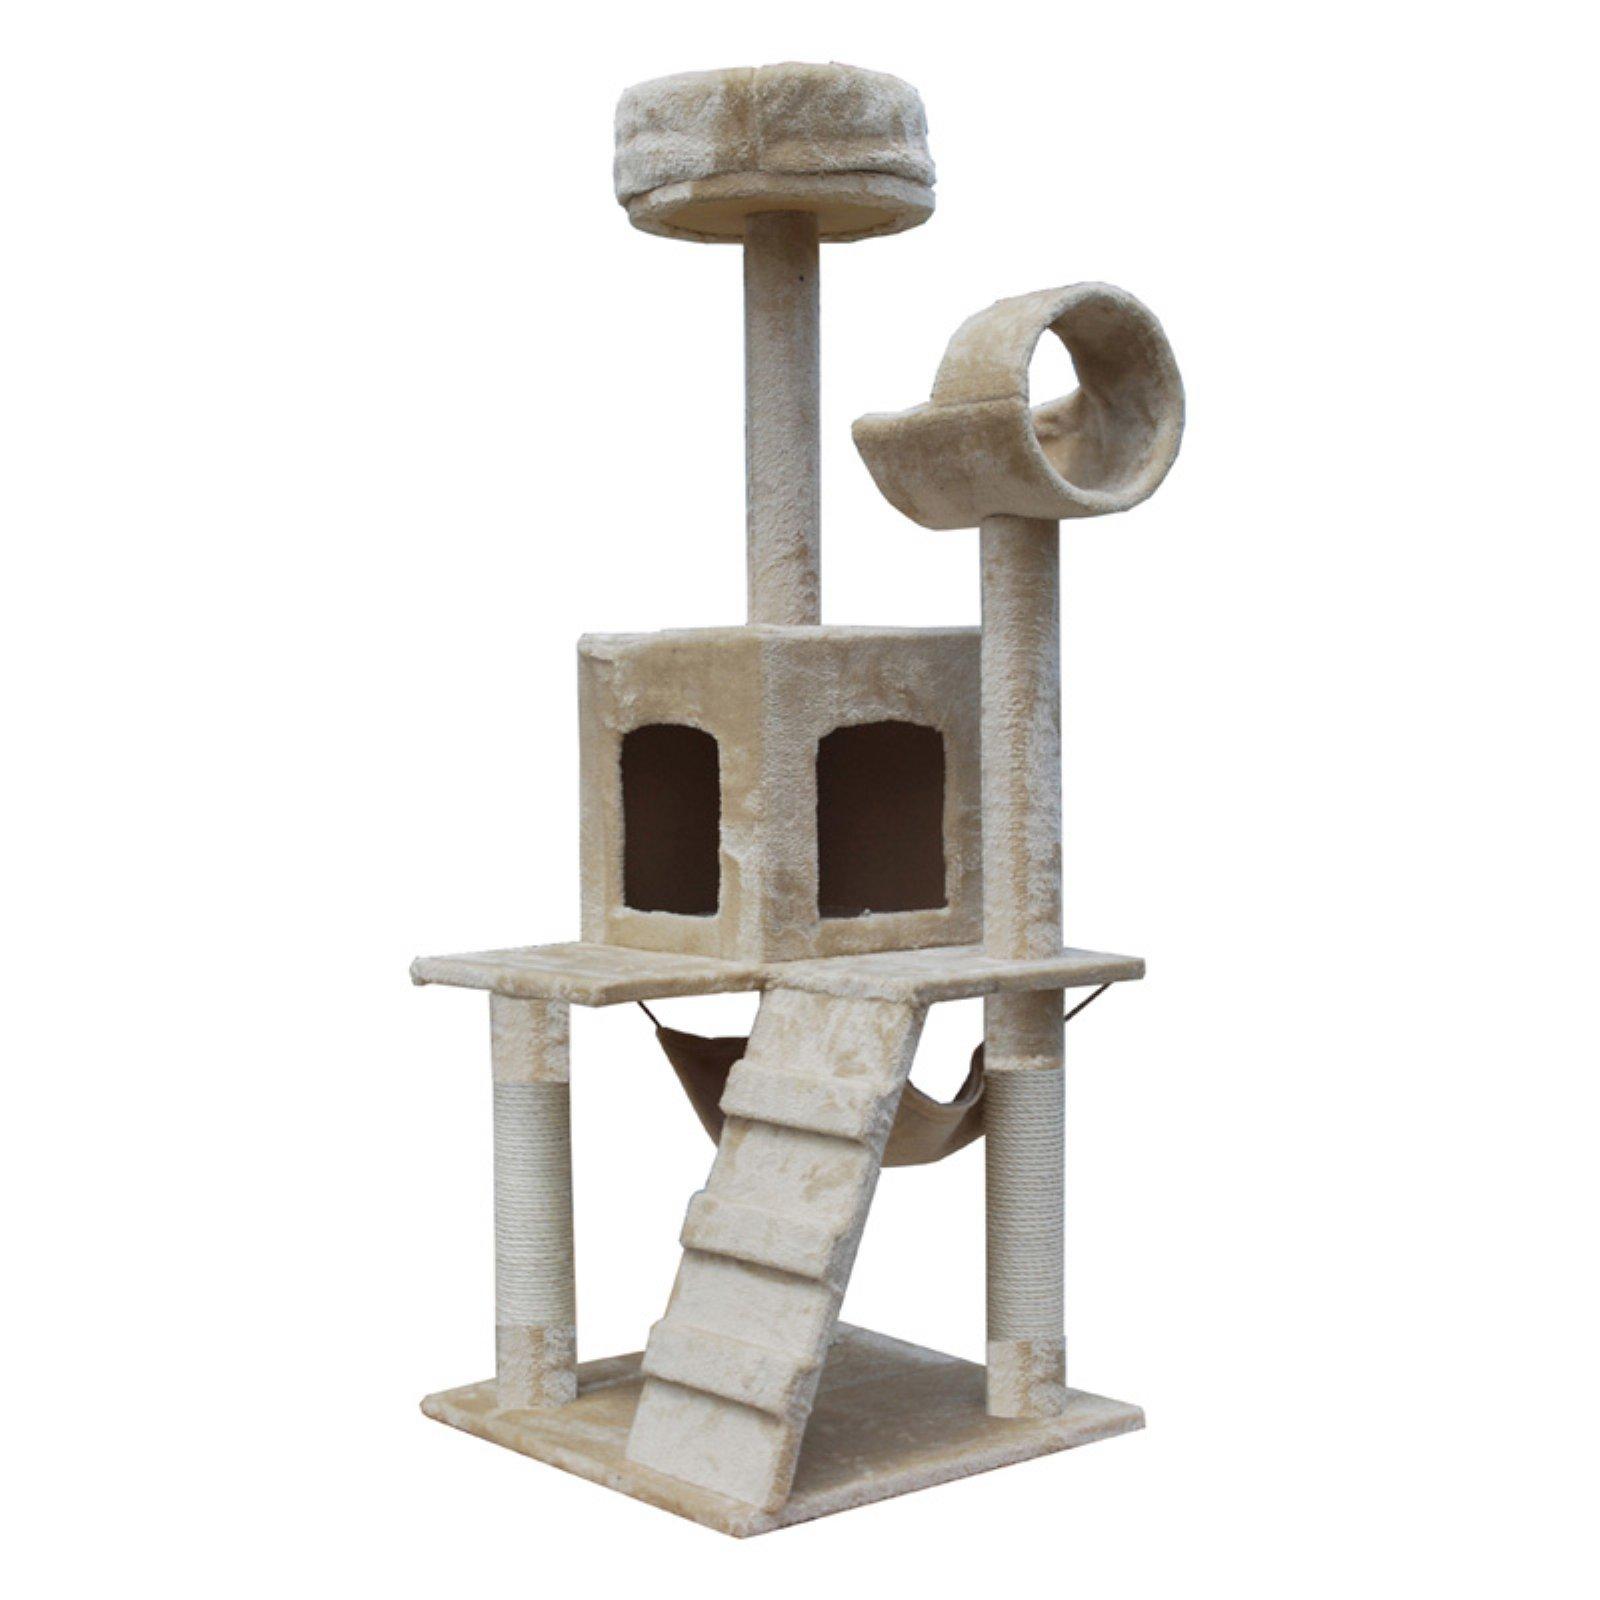 Boomer & George Whiskers 52 in. Cat Tree - Beige